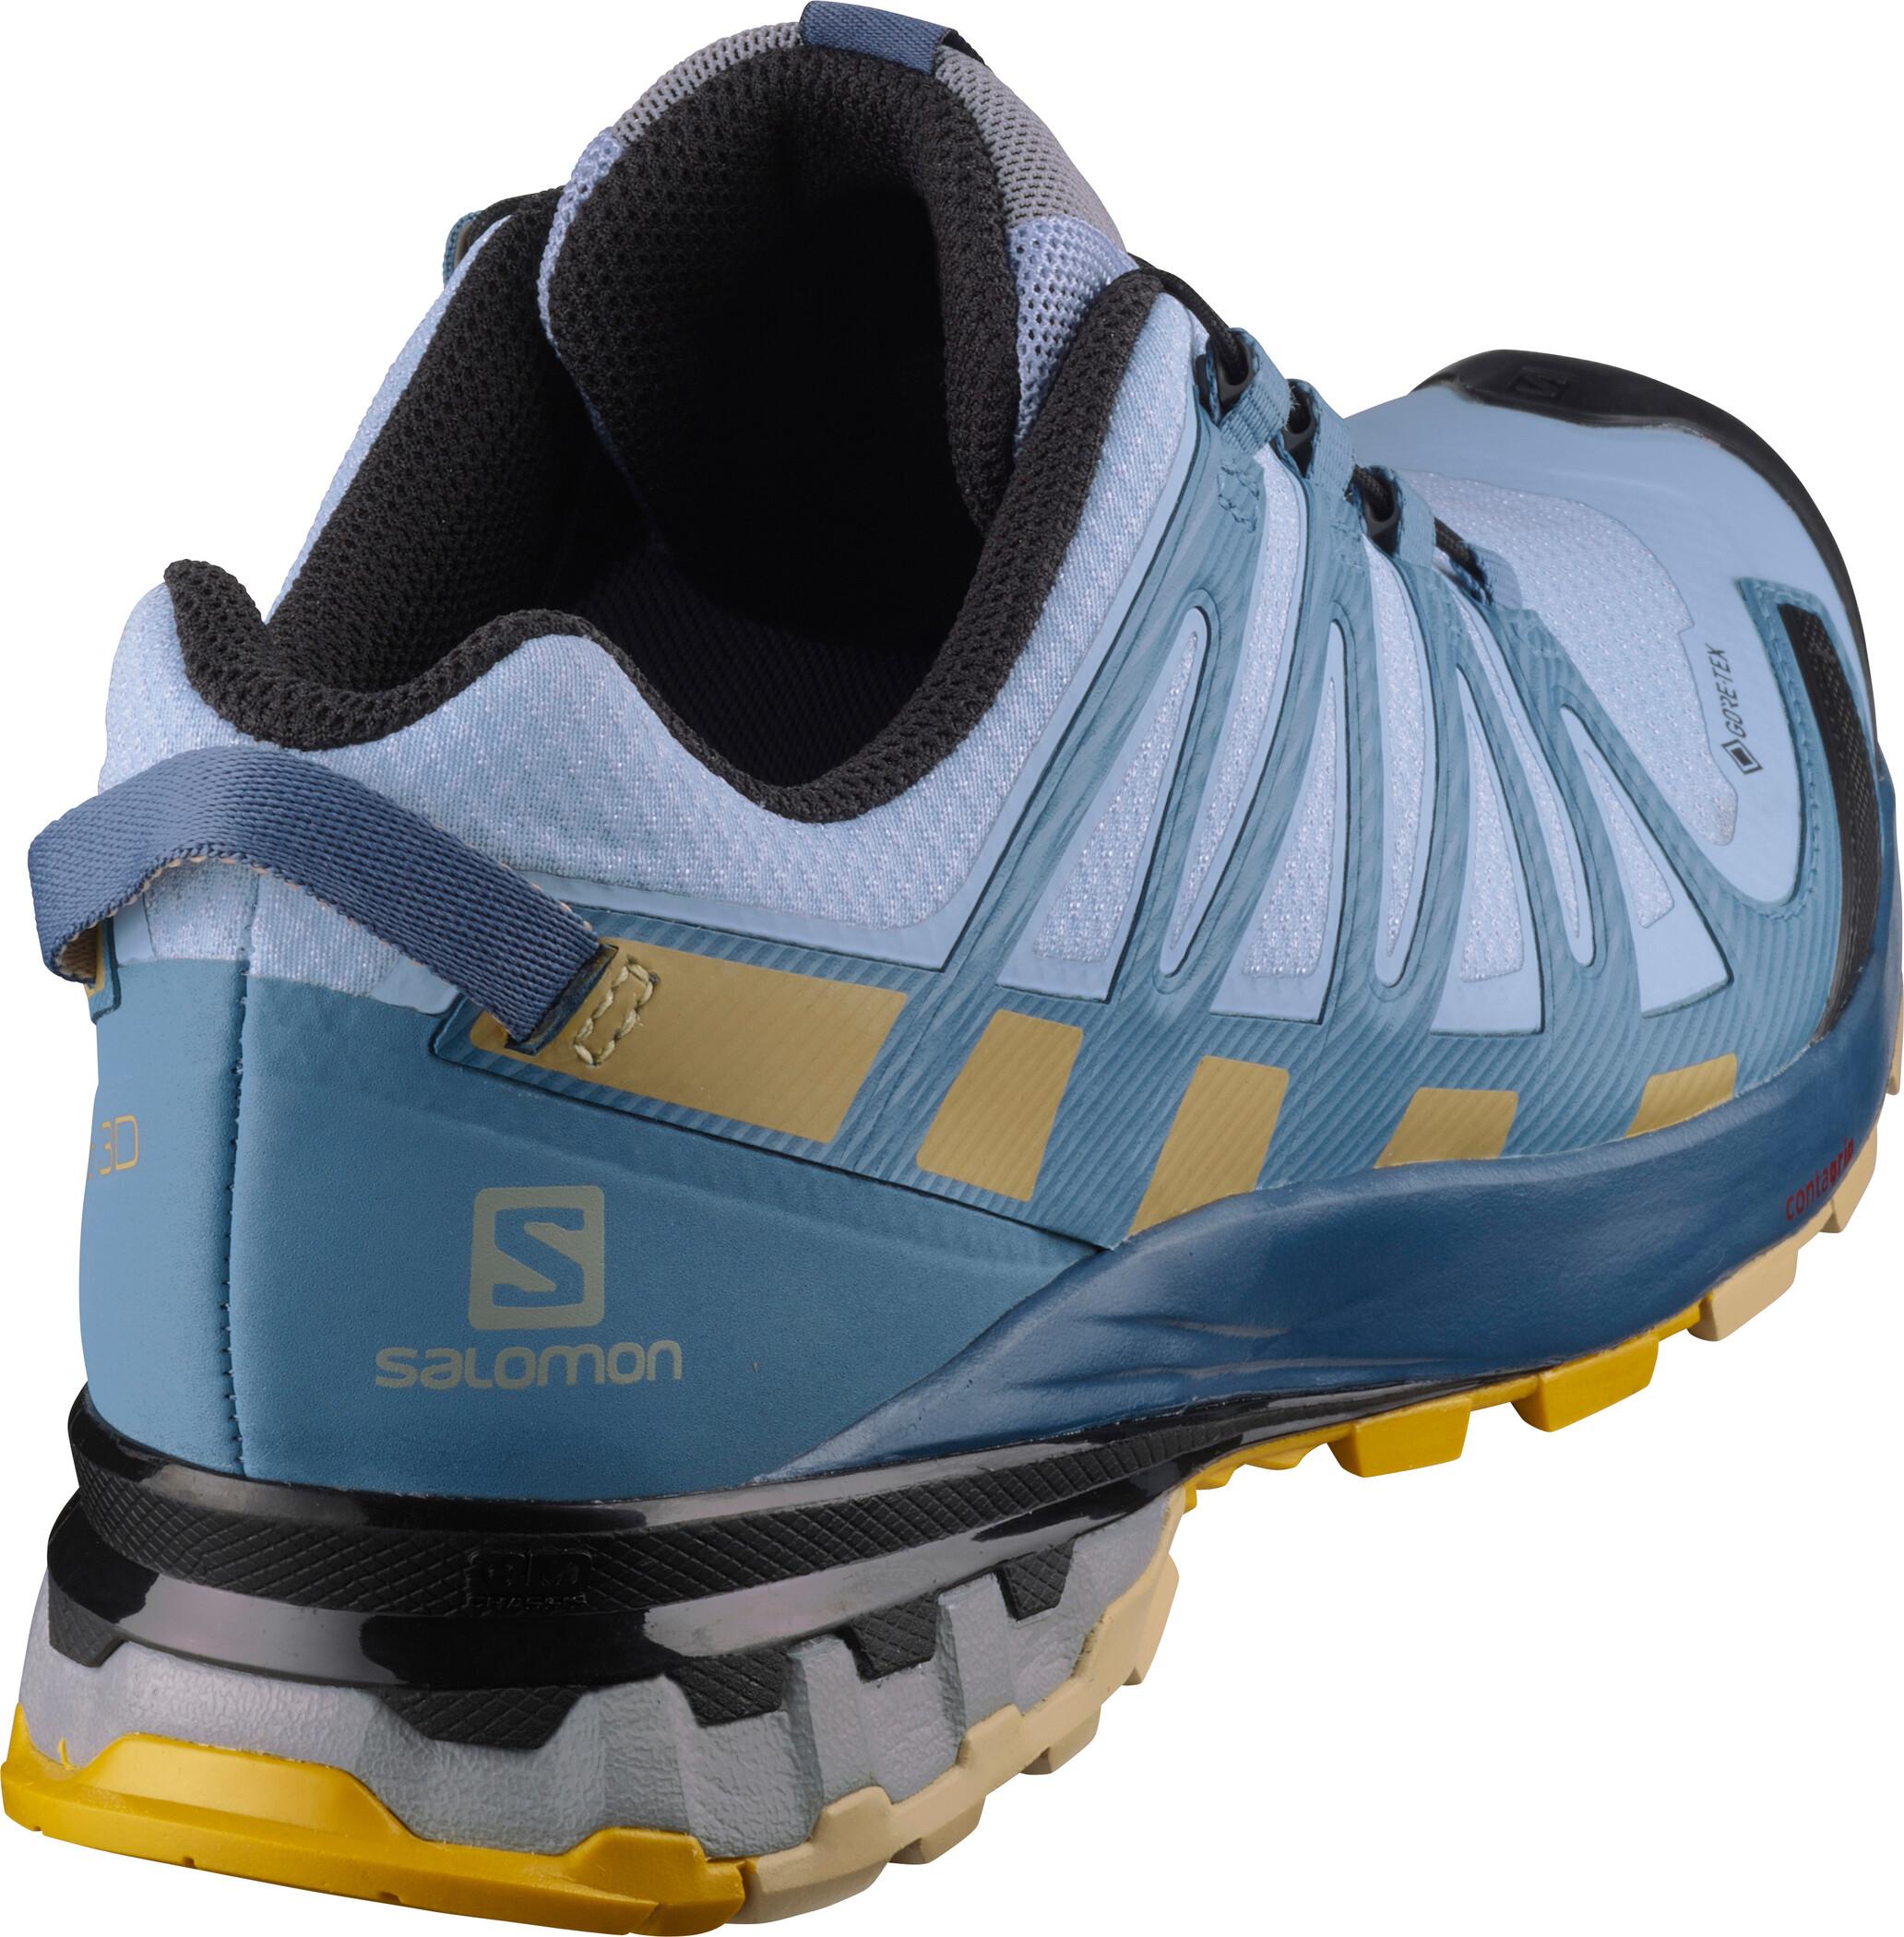 Salomon XA Pro 3D v8 GTX Schuhe Damen kentucky bluedark denimpale khaki